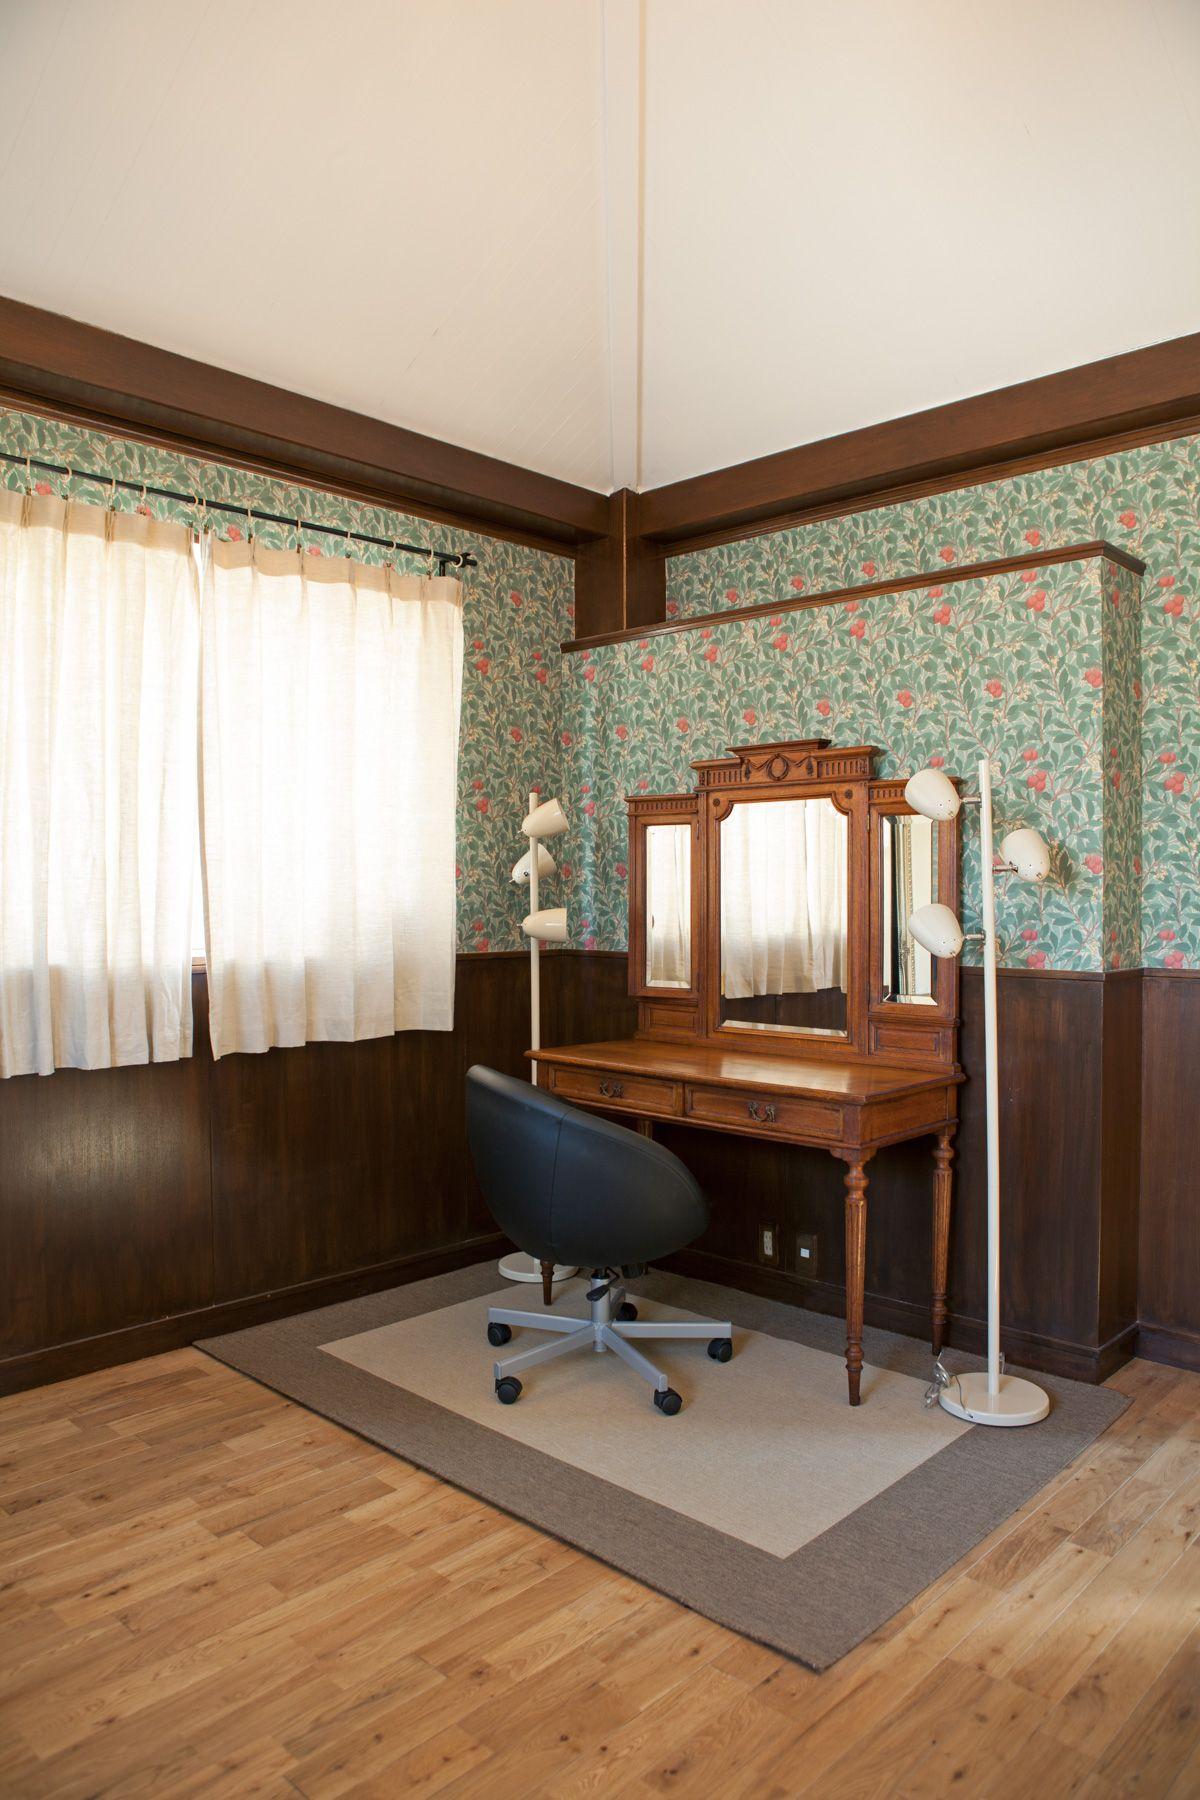 Pastis Roppongi bst  (パスティス六本木 ビースタ)room3